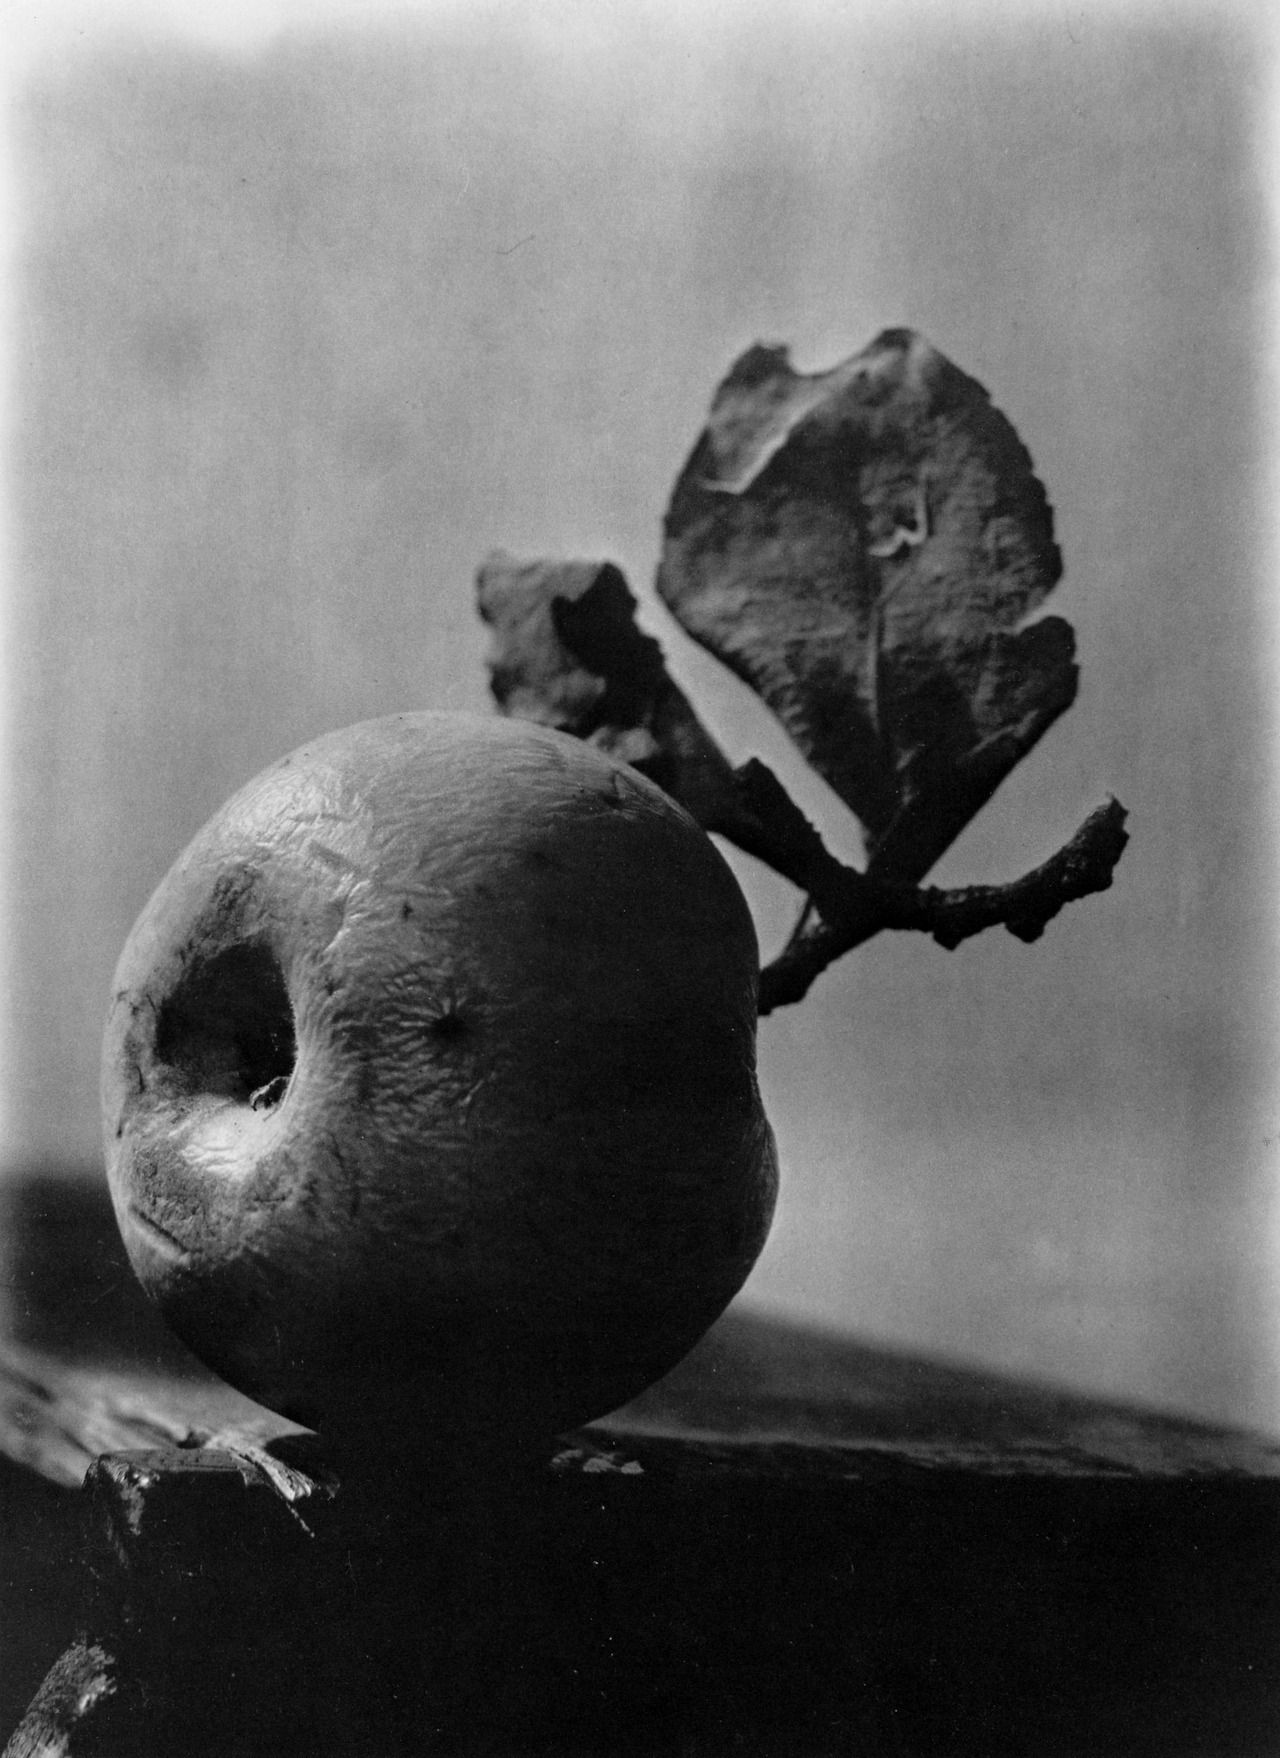 Labrancaro josef sudek b sides great photographers famous still life photographers